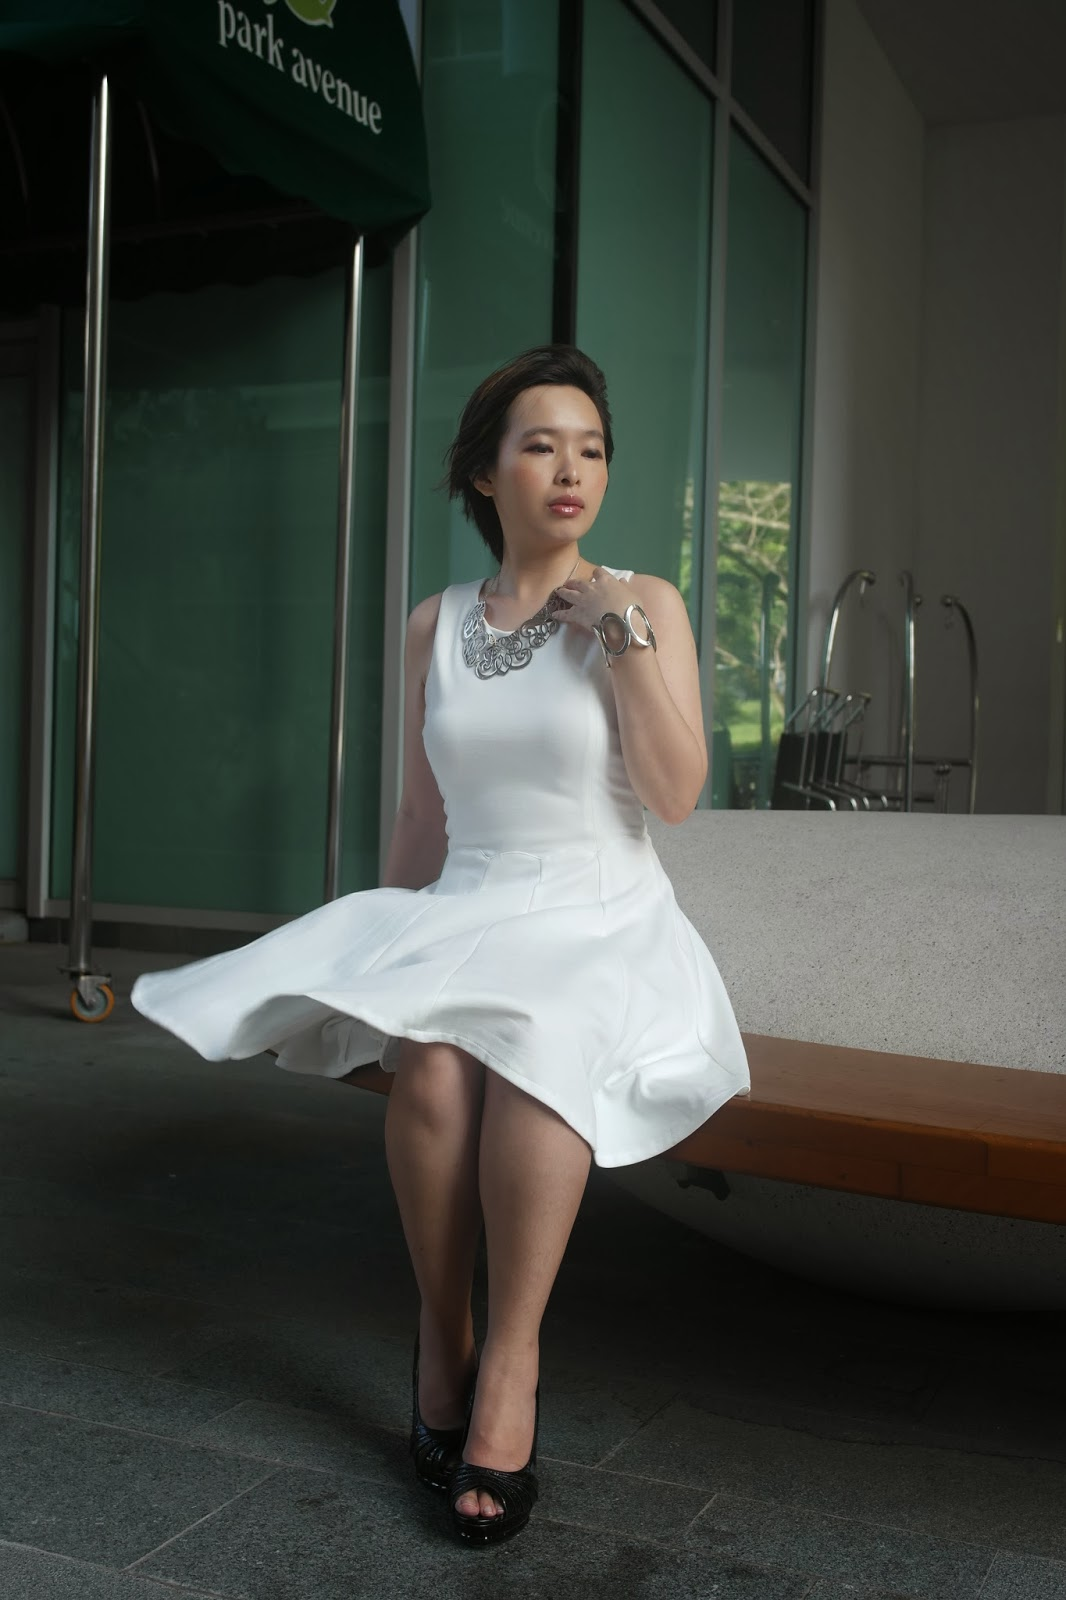 Marilyn monroe white dress accessories